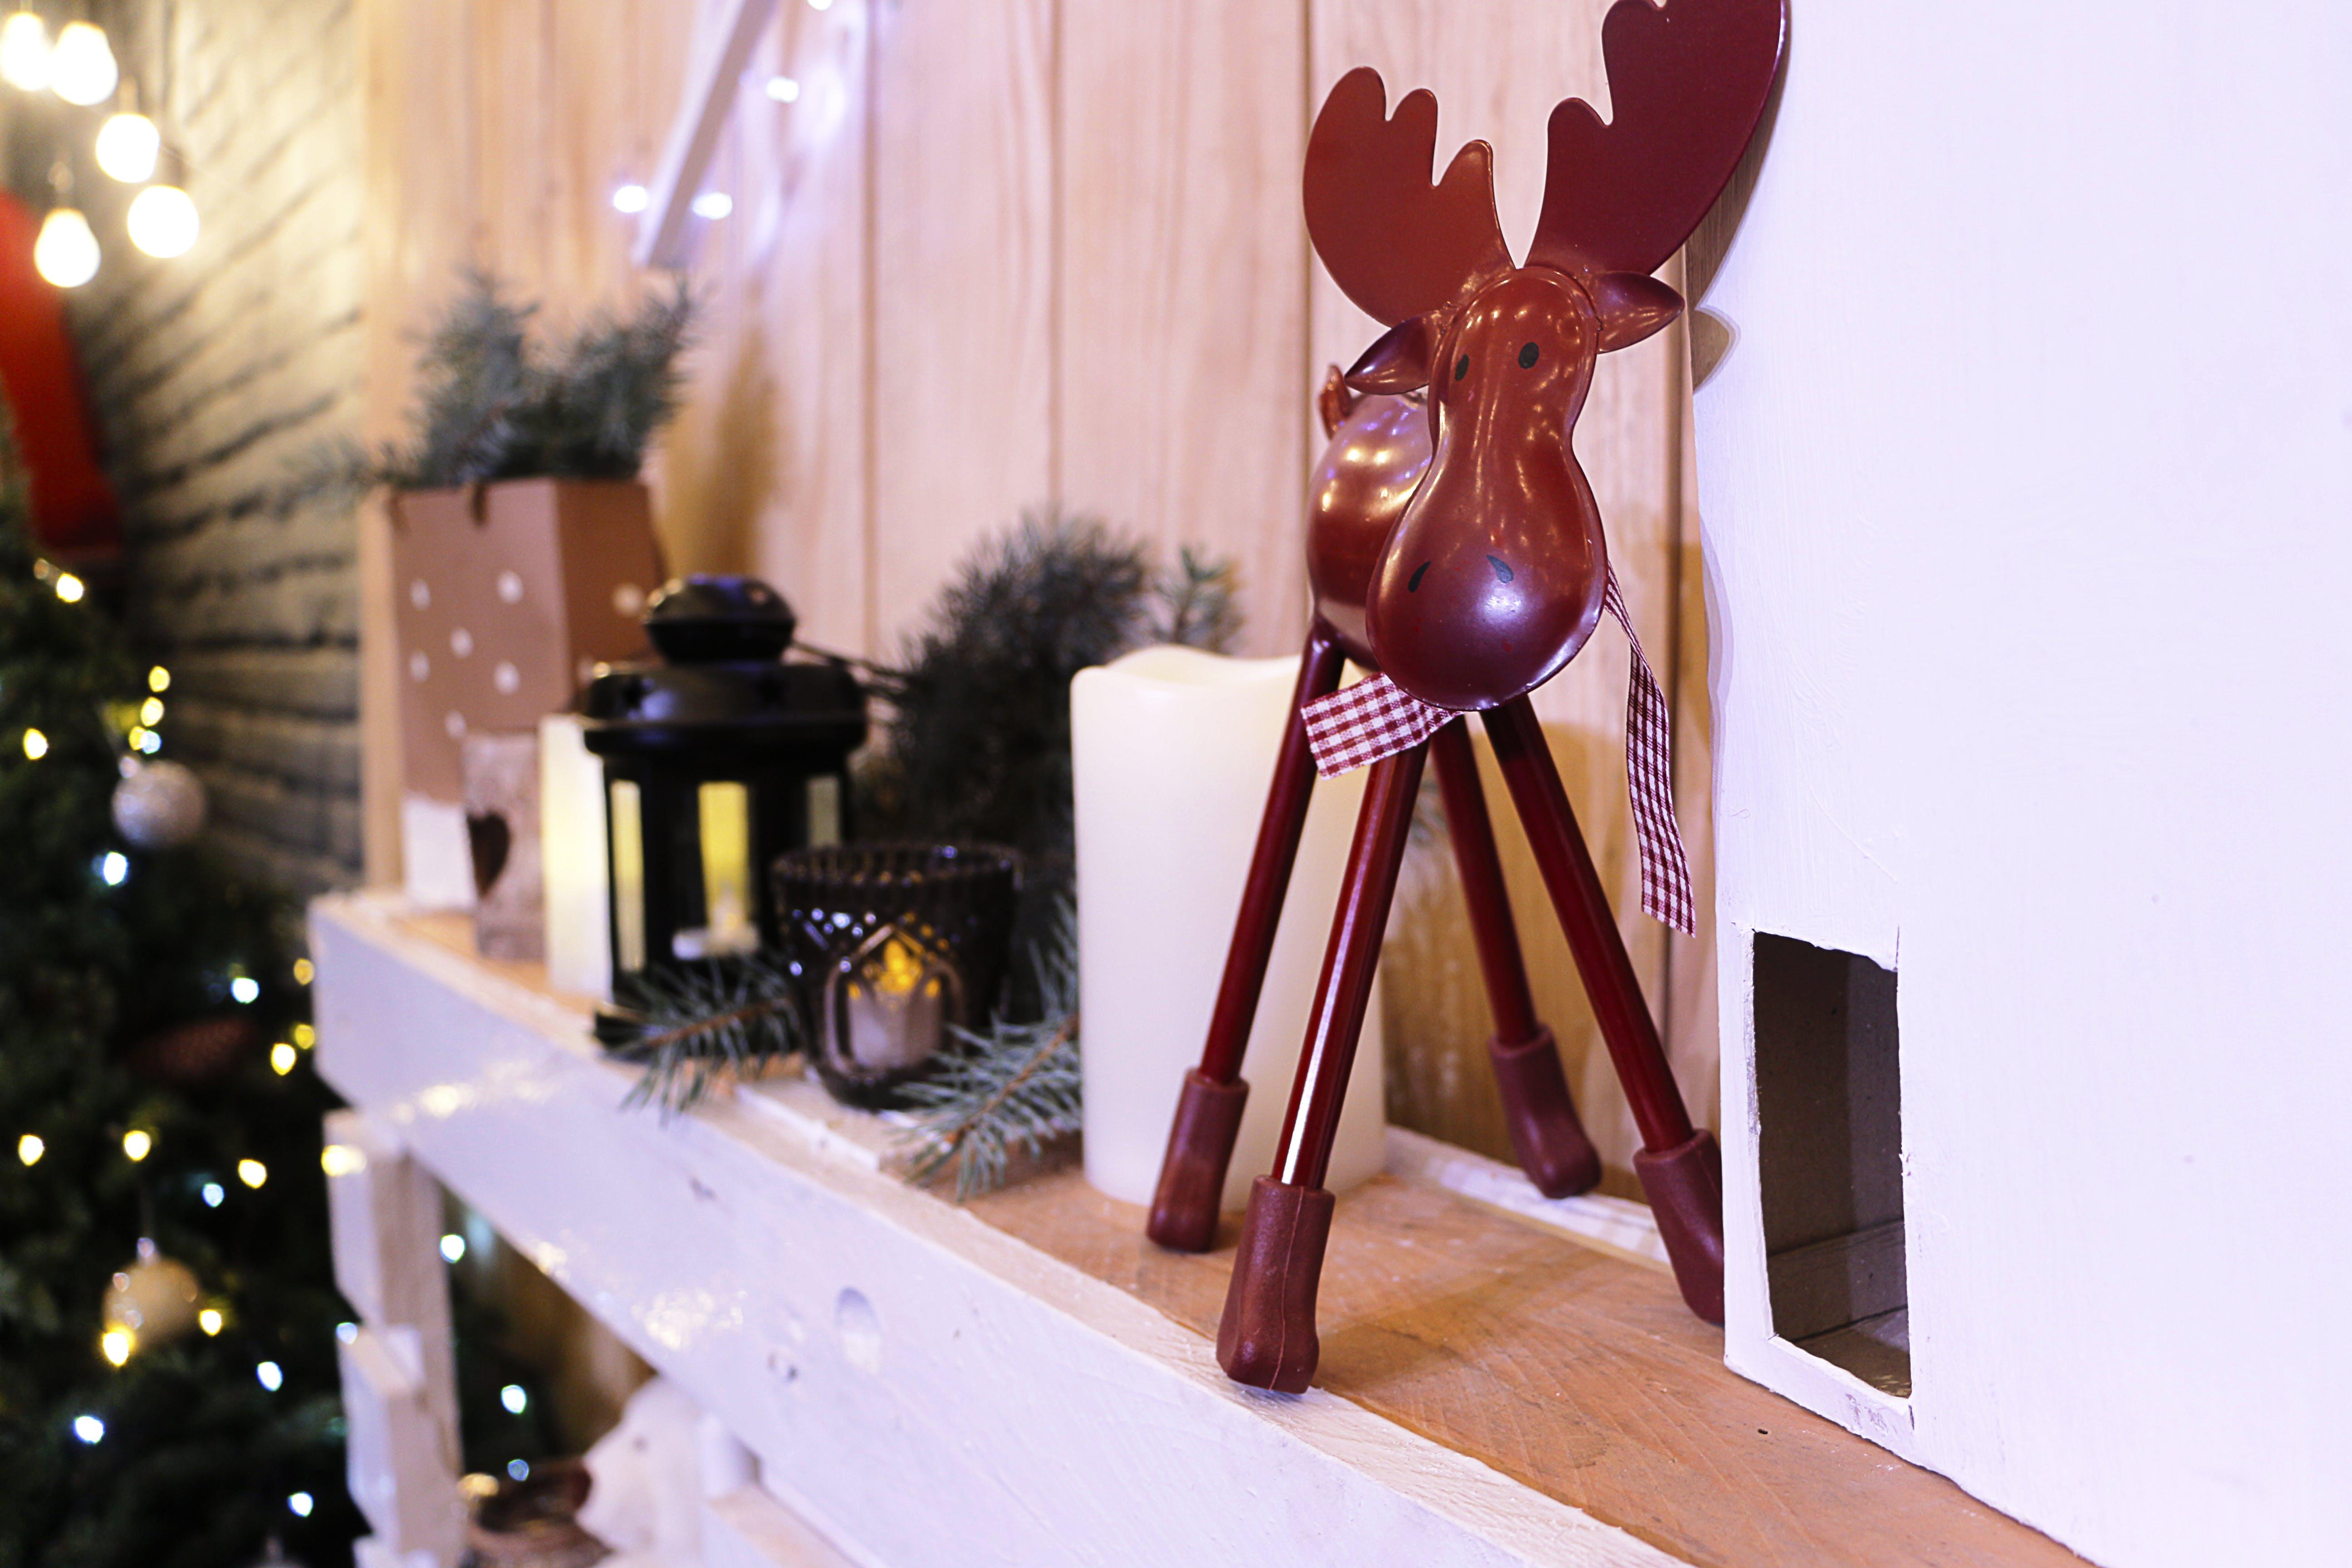 Reindeer Metal Ornament on Shelf